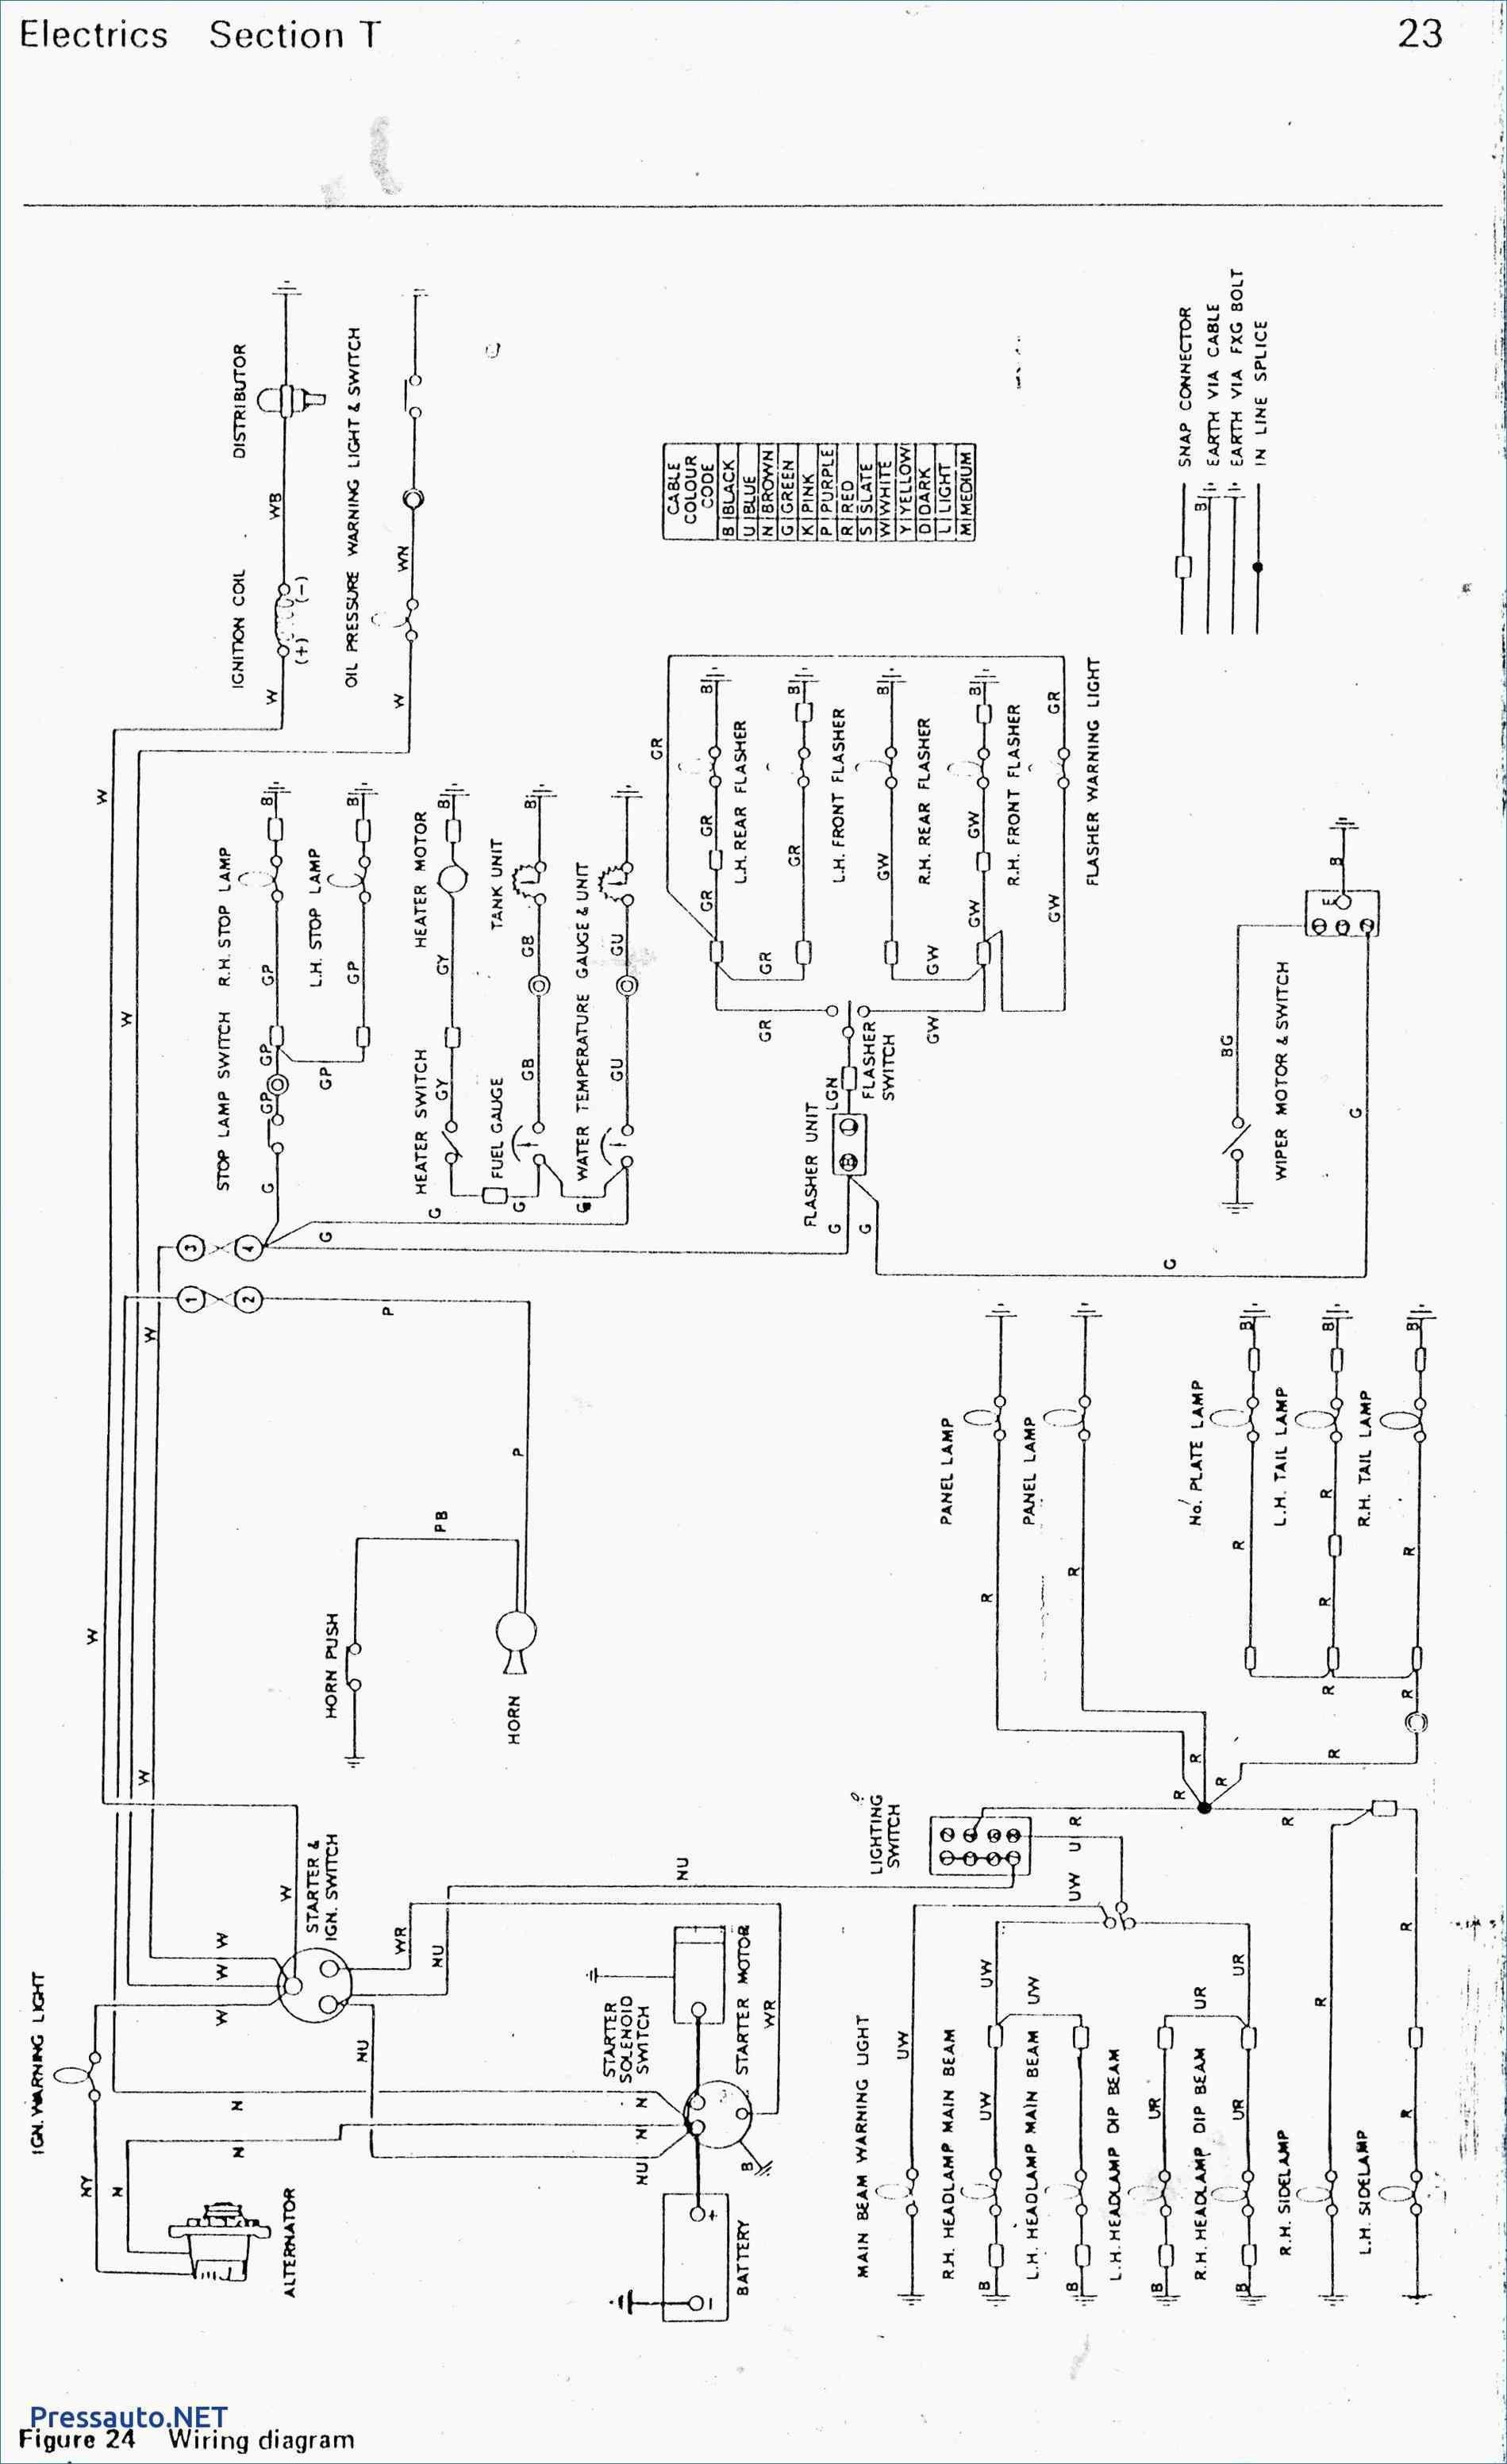 american sportworks wiring diagram yale wiring diagram e1 wiring diagram  yale wiring diagram e1 wiring diagram